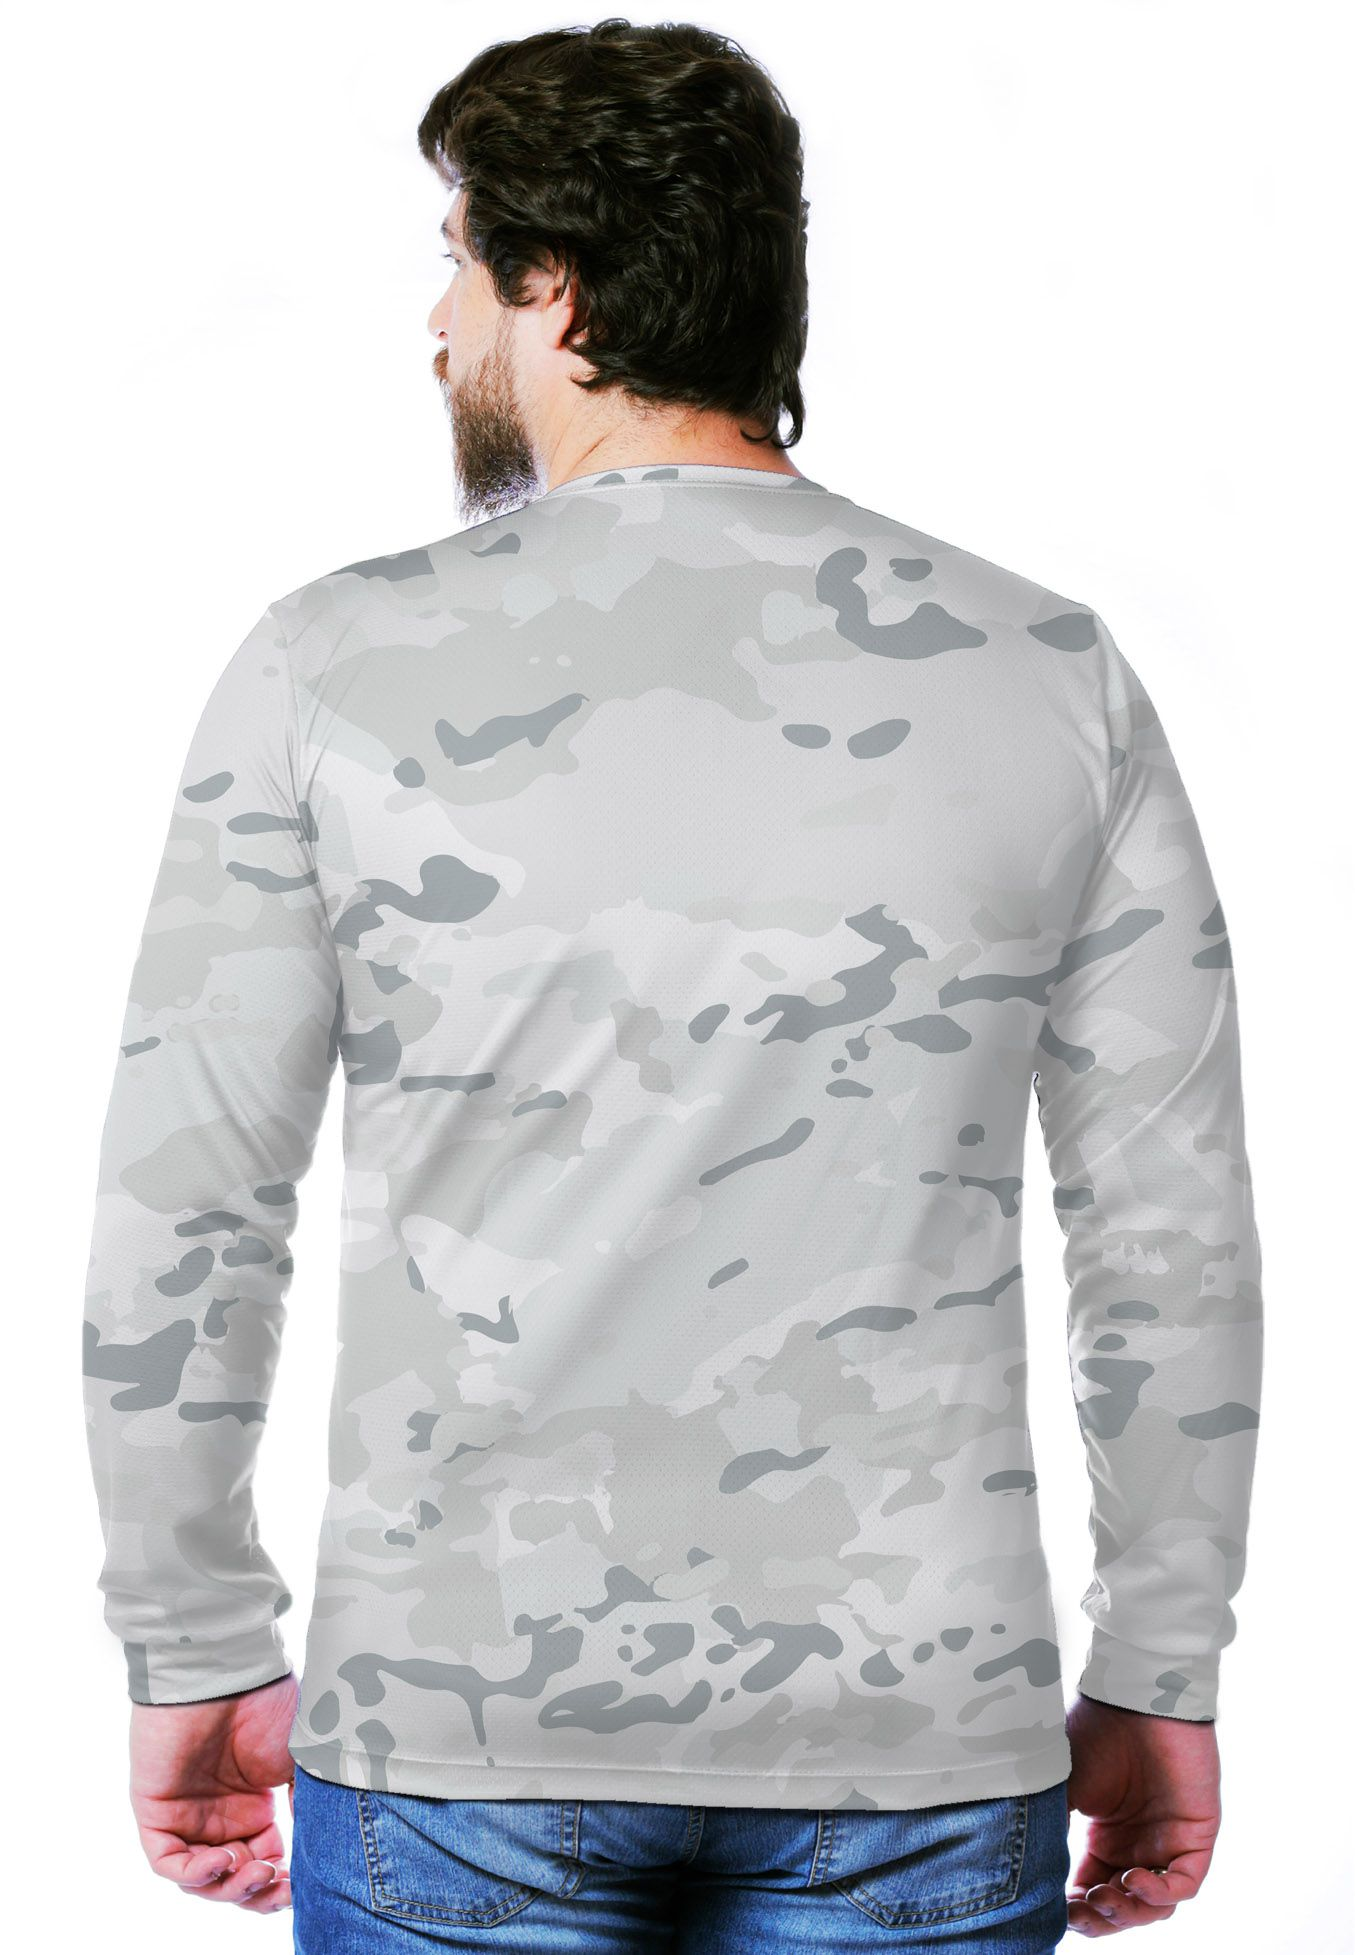 Camiseta  Camuflada Multicam Alpine Manga Longa Masculina  - REAL HUNTER